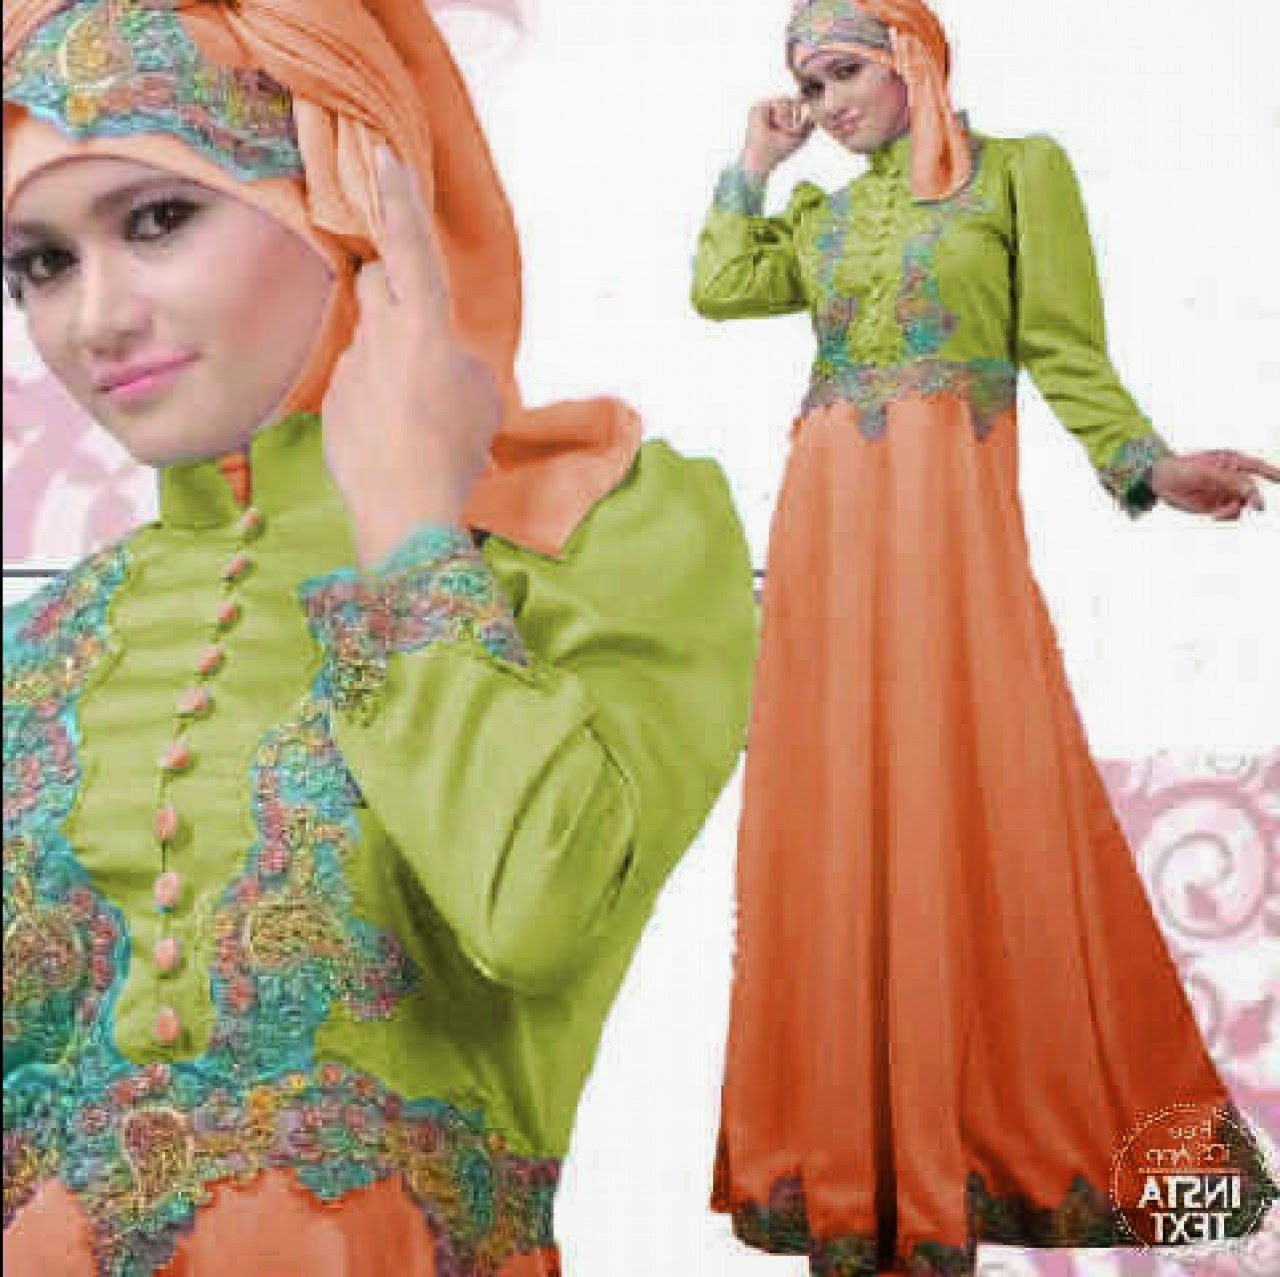 Bentuk Model Baju Lebaran Muslim Terbaru Tldn Kumpulan Foto Model Baju Kebaya Lebaran Terbaru 2018